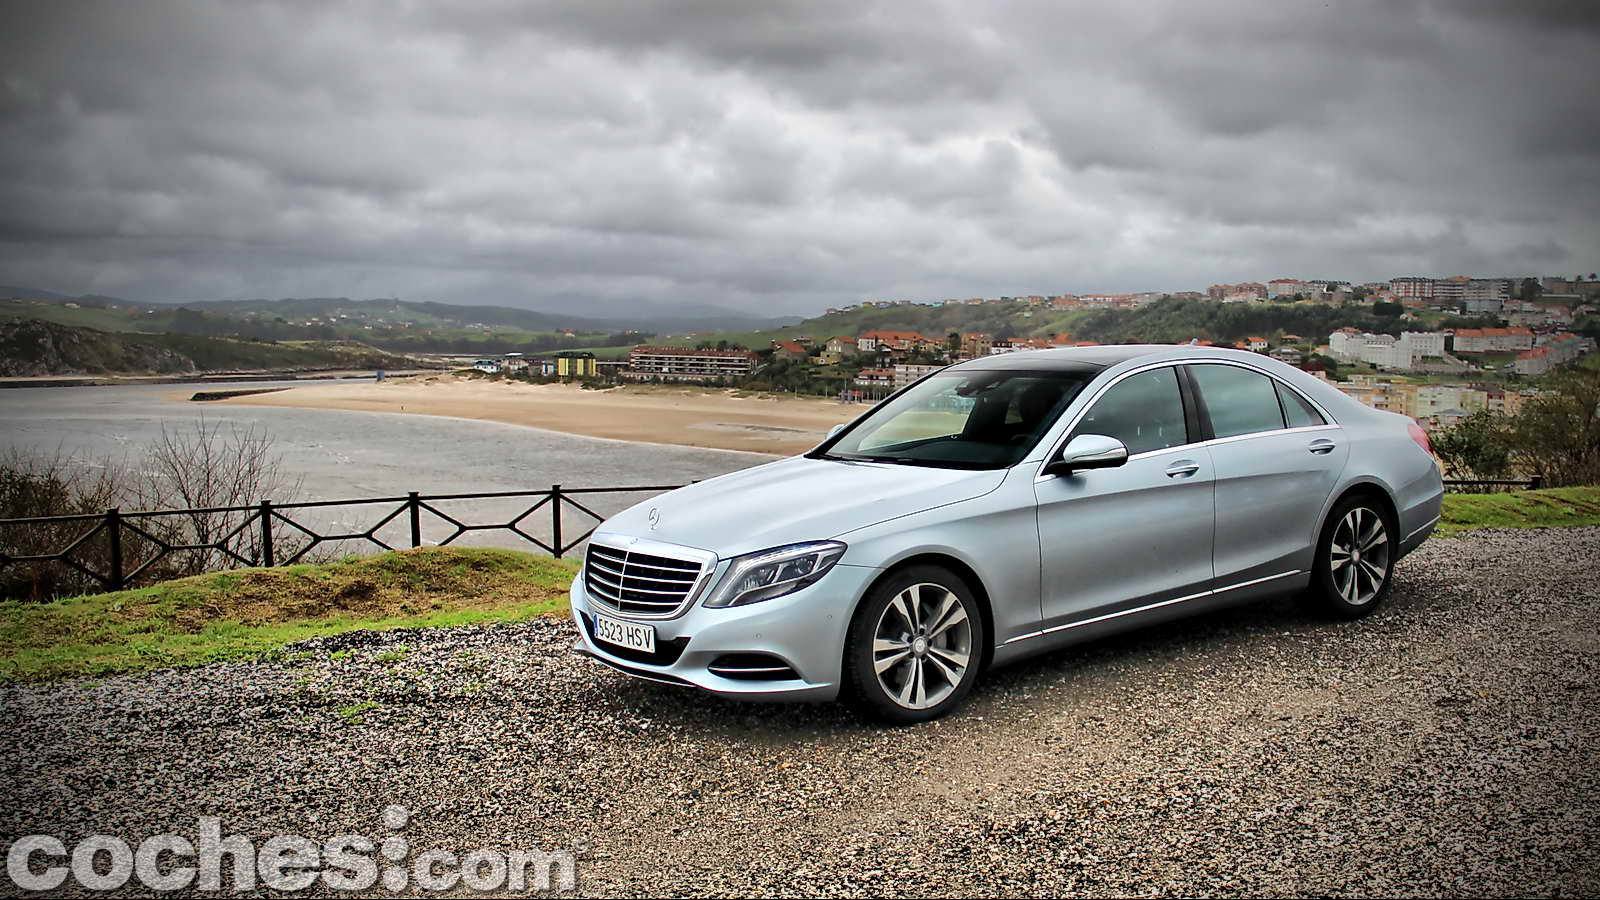 Mercedes_Benz_Clase_S_350_BlueTEC_01